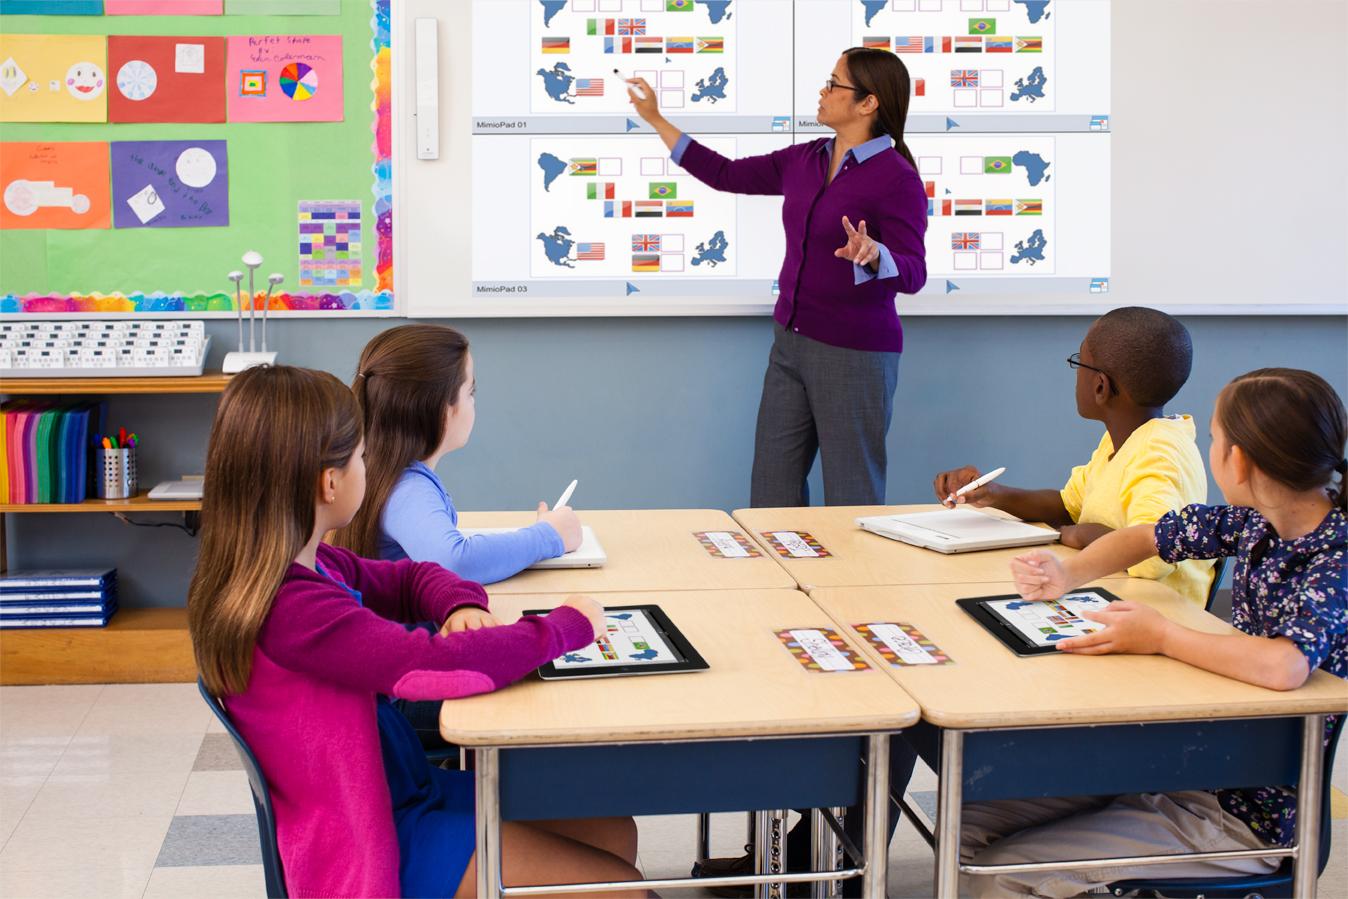 Collaborative Classroom Van Pelt : Mimiostudio tantermi szoftver mimio